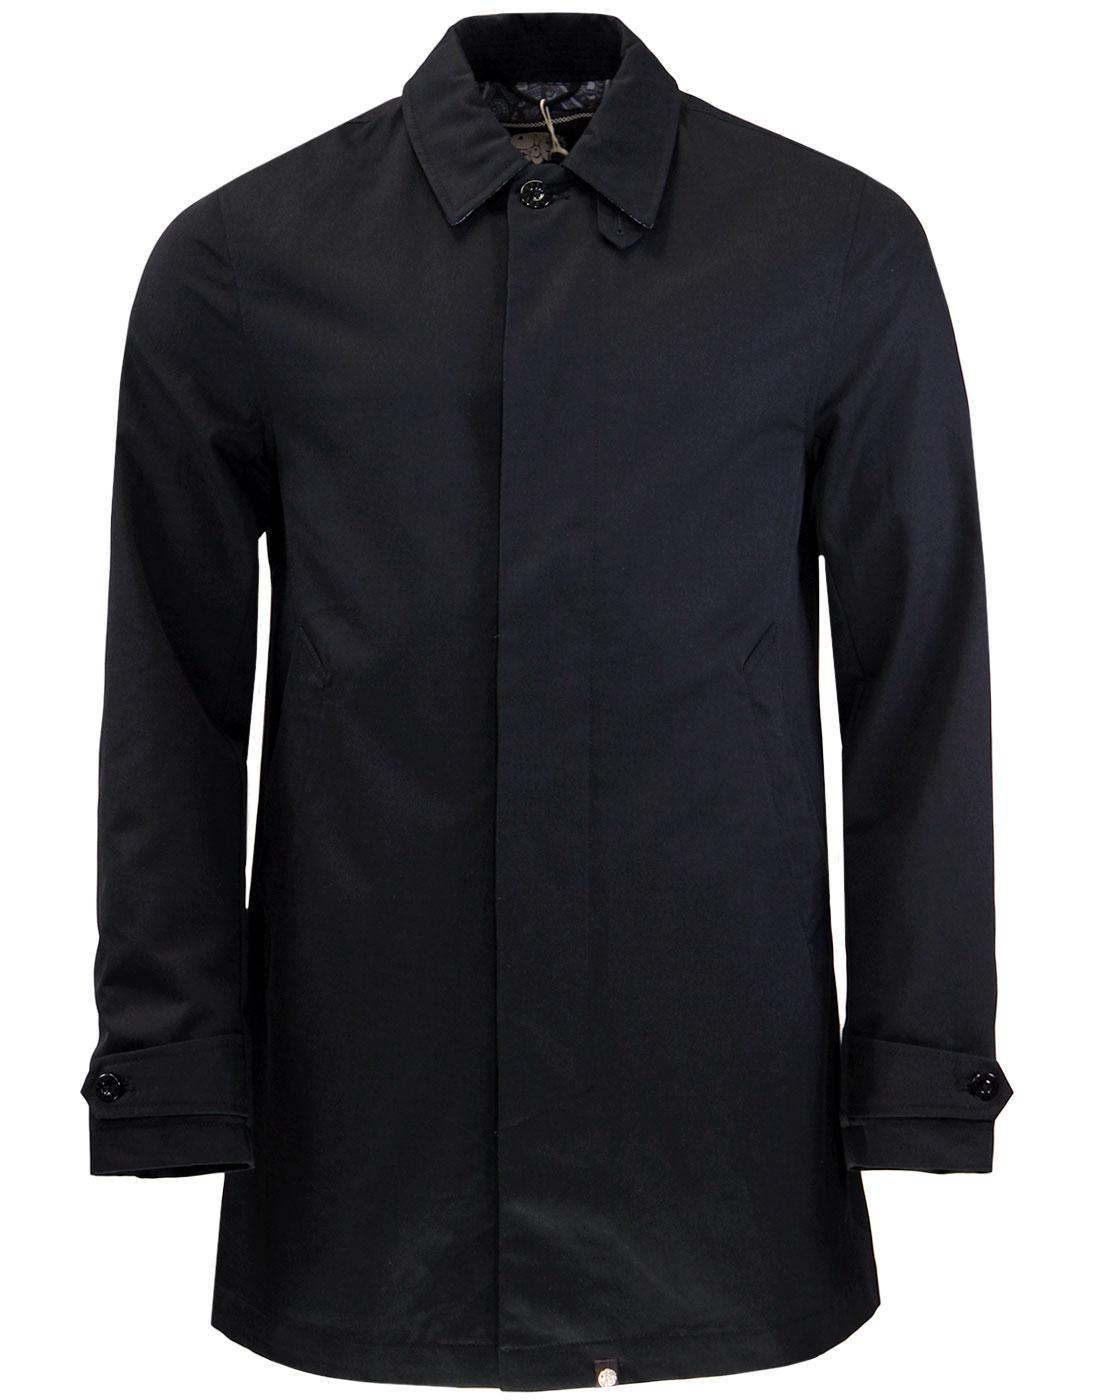 Glendon PRETTY GREEN Mod Button Up Mac Jacket (B)